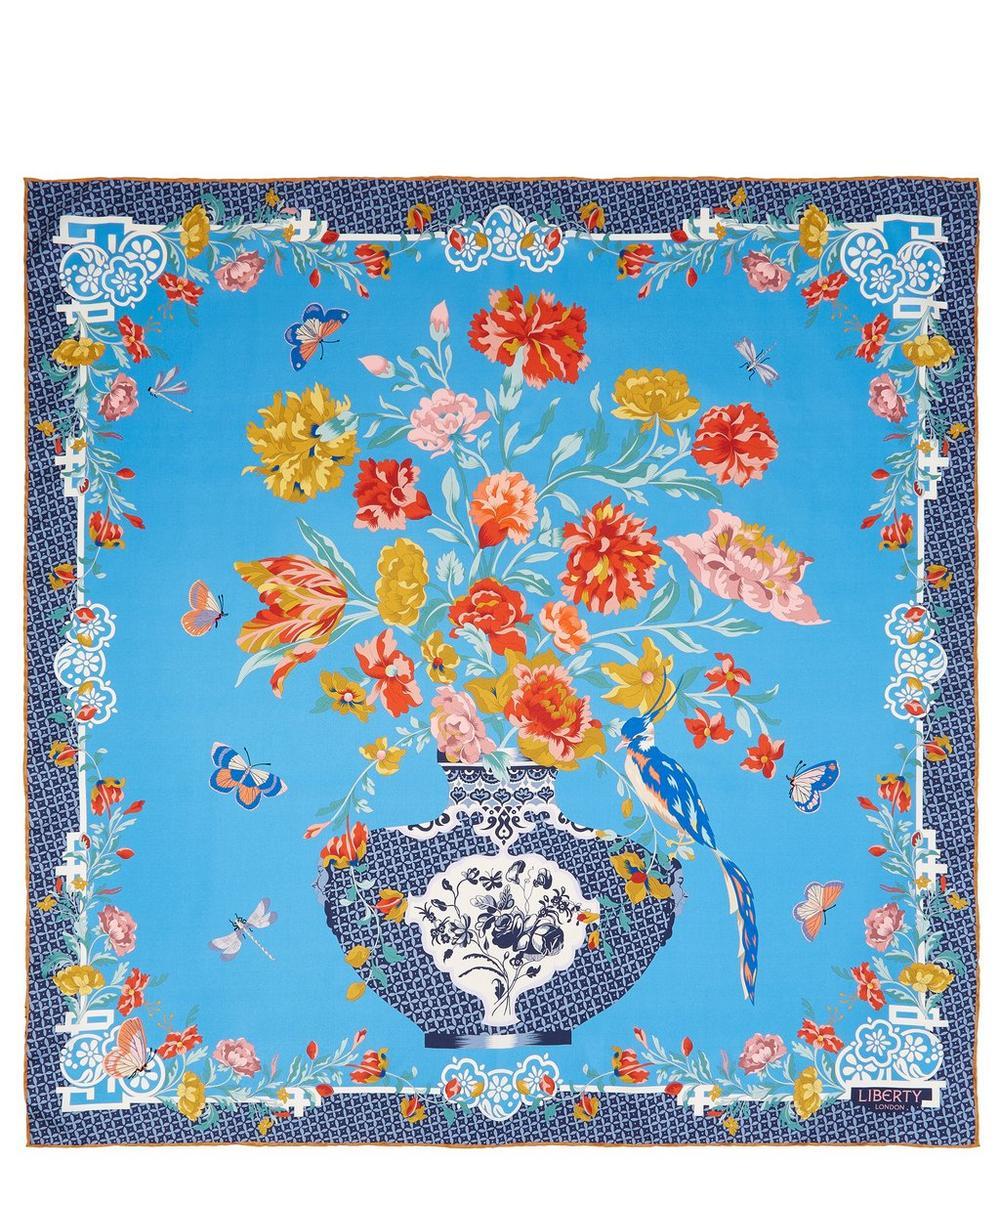 Patience 90 x 90cm Silk Twill Scarf